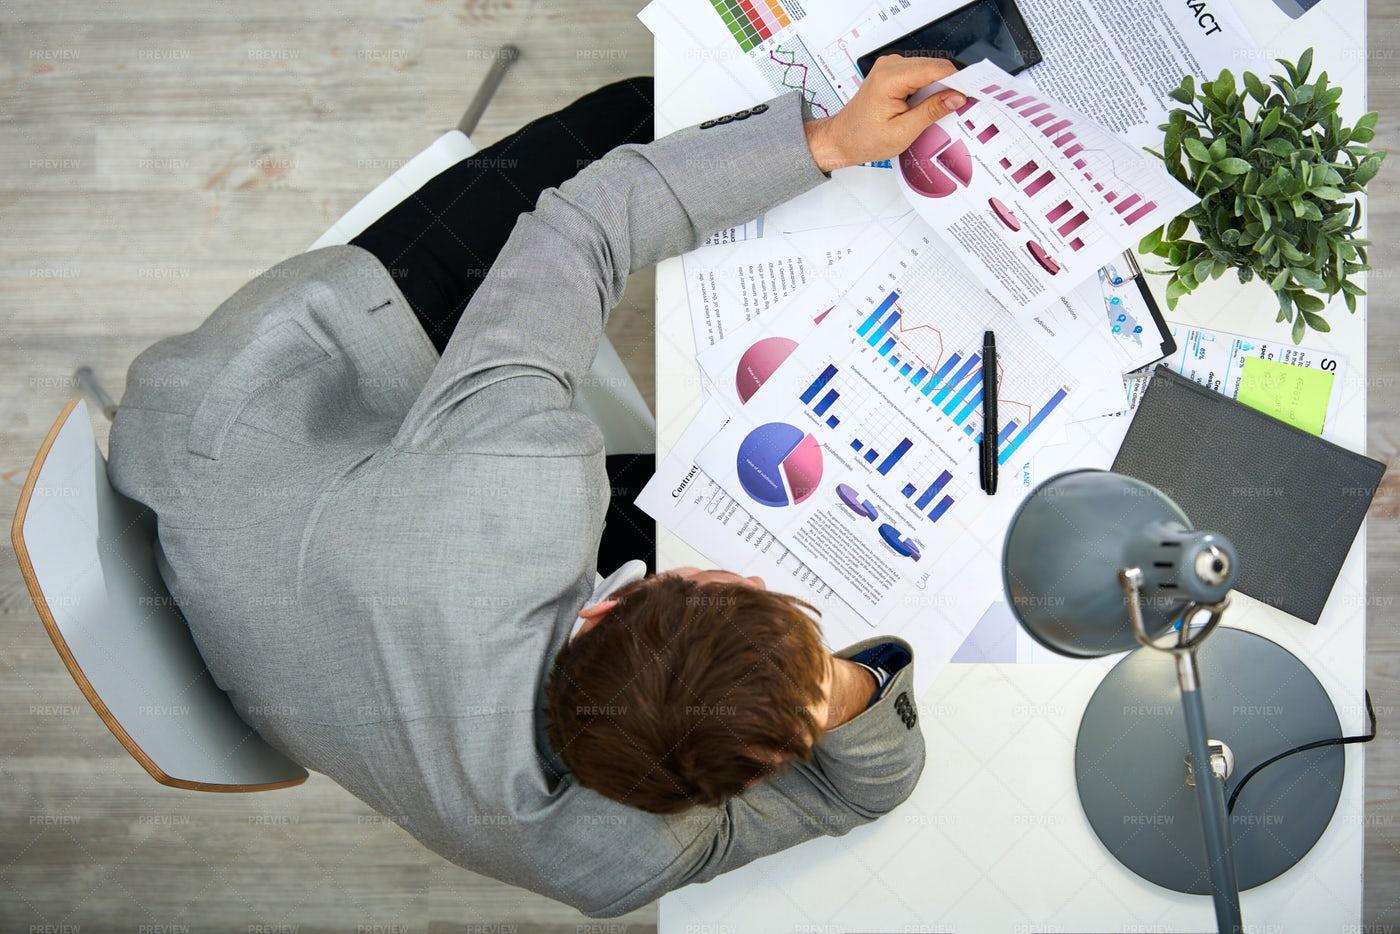 Analyzing Statistic Data: Stock Photos